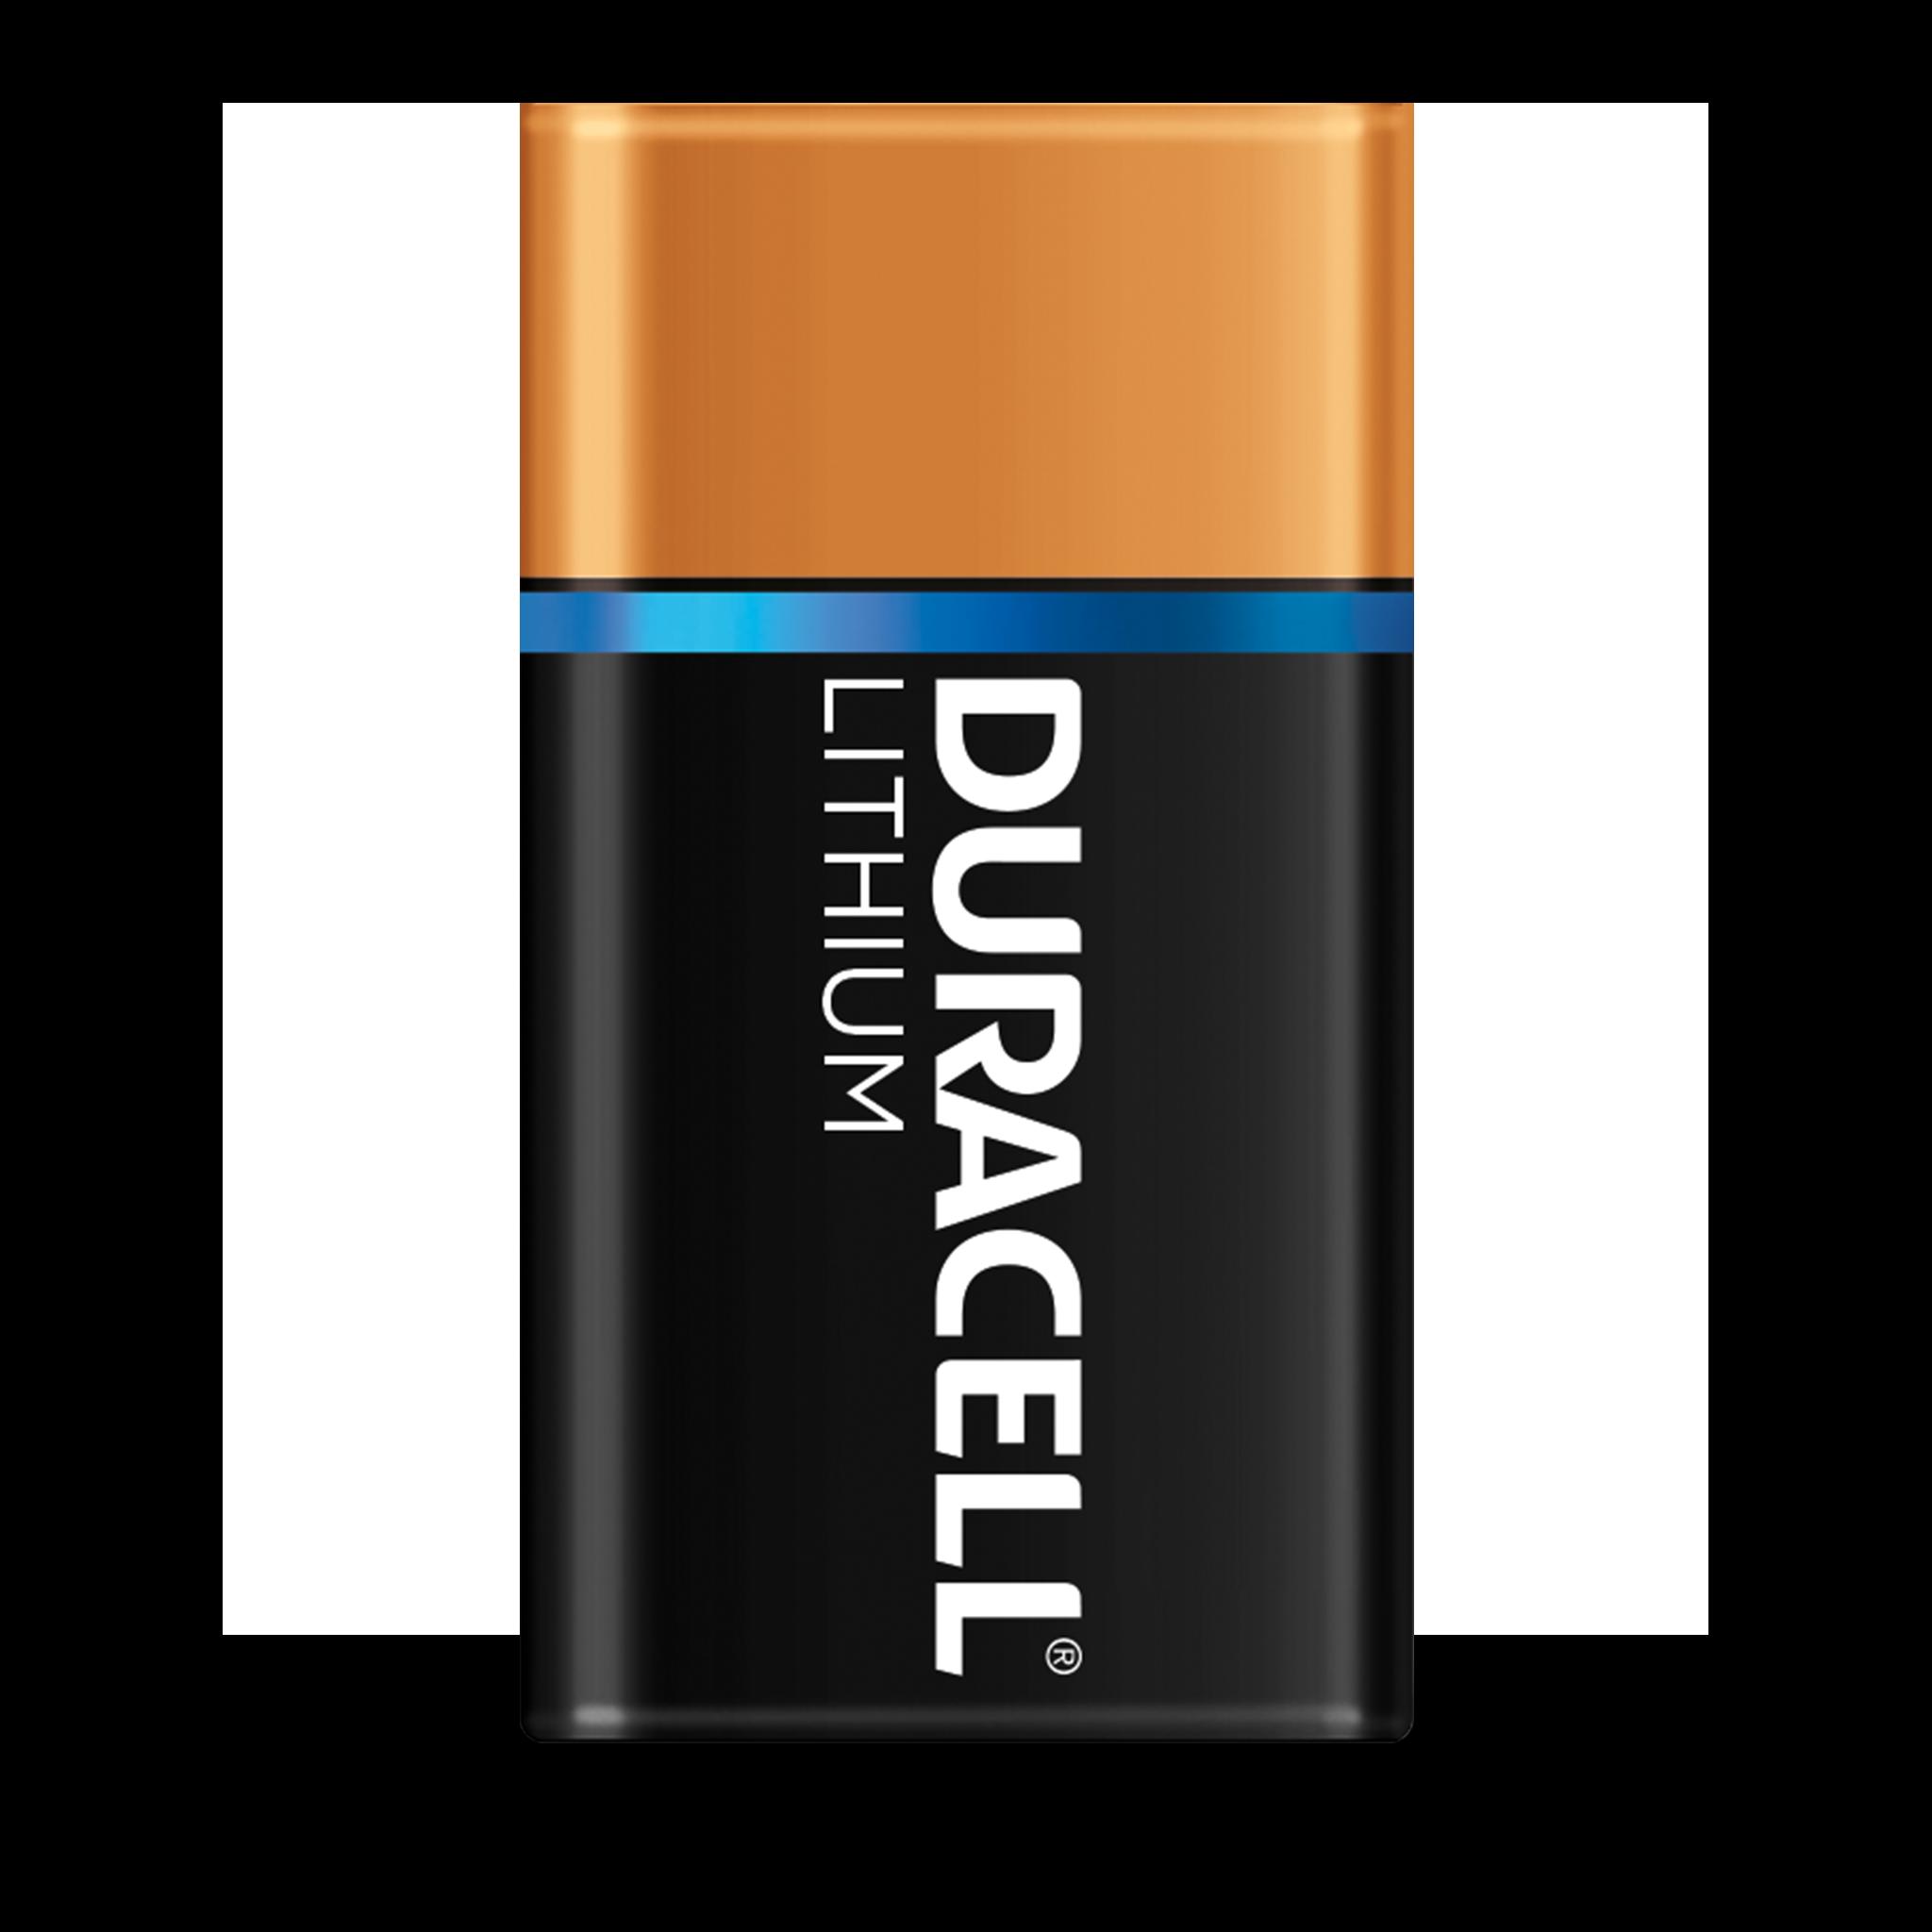 Standalone CR3 battery